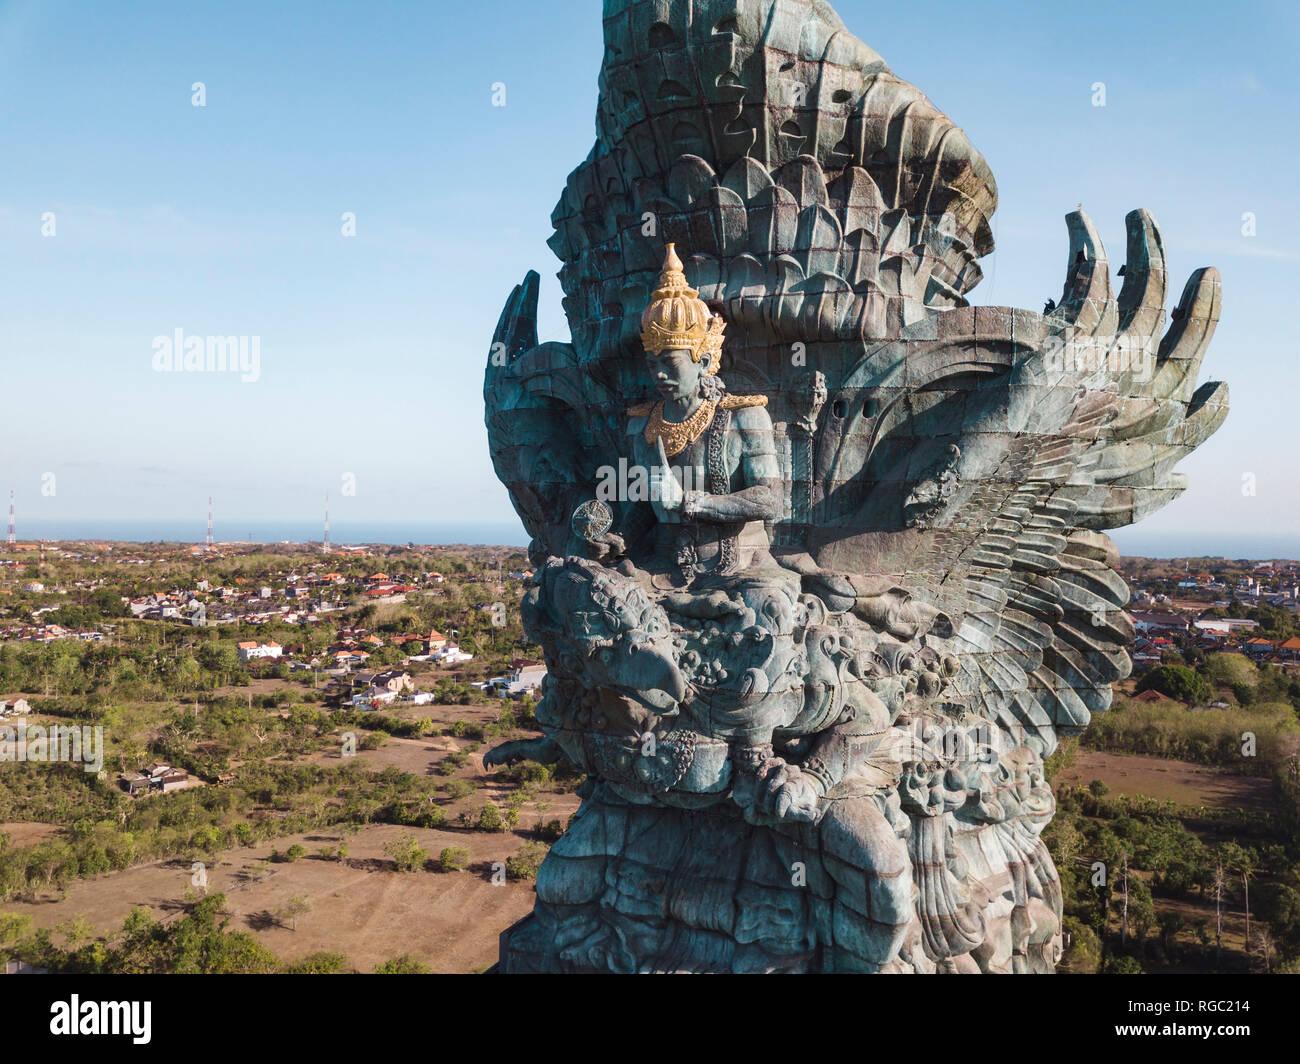 Indonesia, Bali, Aerial view of GWK park, Vishnu statue and Garuda Stock Photo